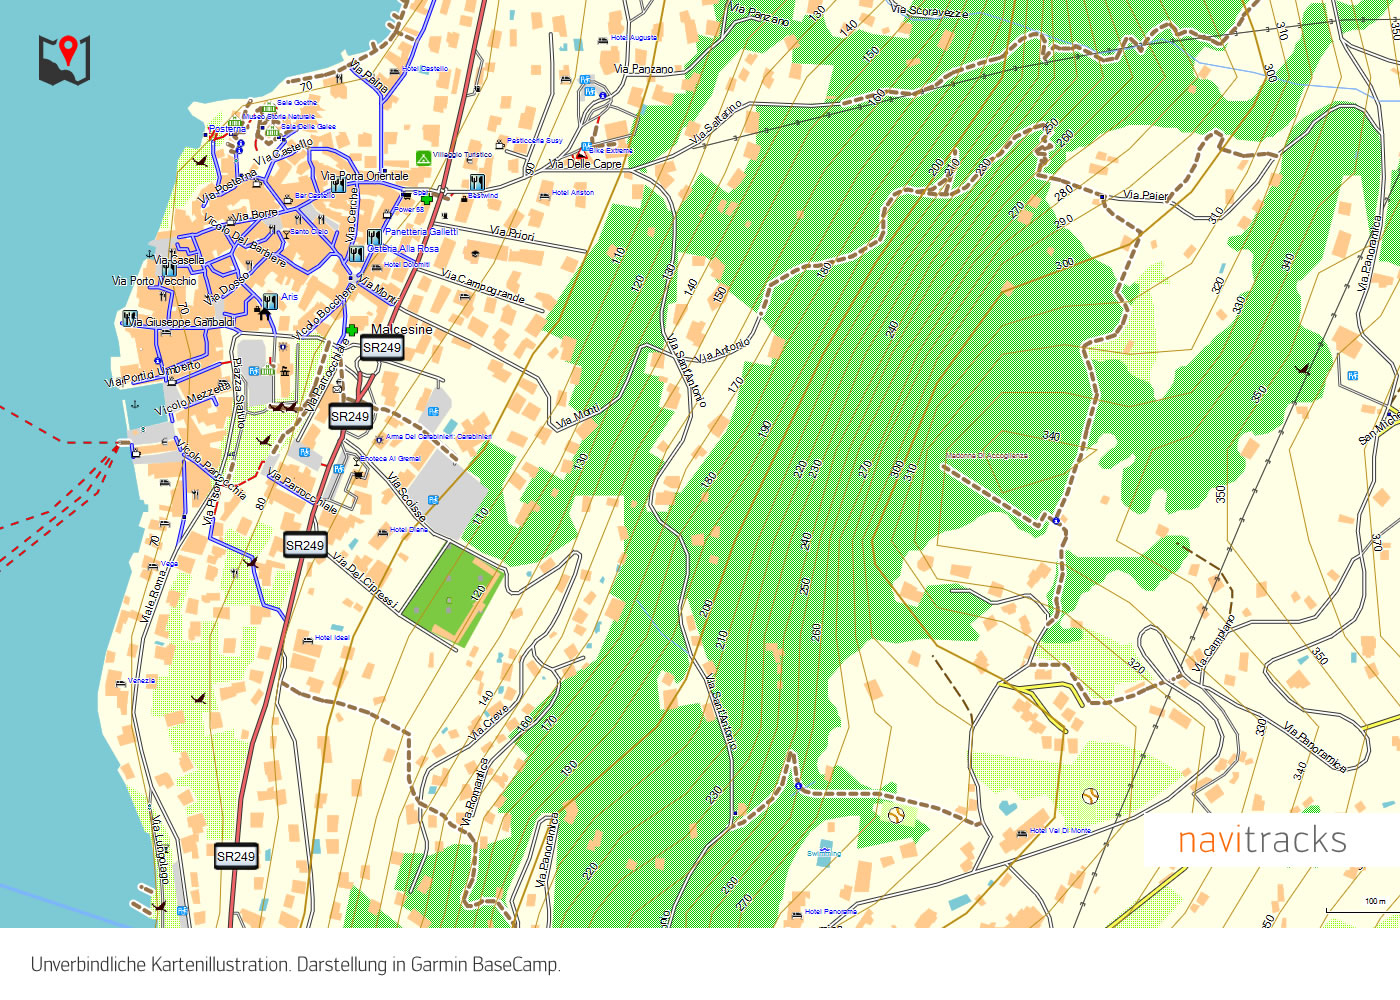 Neuseeland Topo Gps Karte Fur Garmin Mit 10m Srtm Hohelinien 4gb